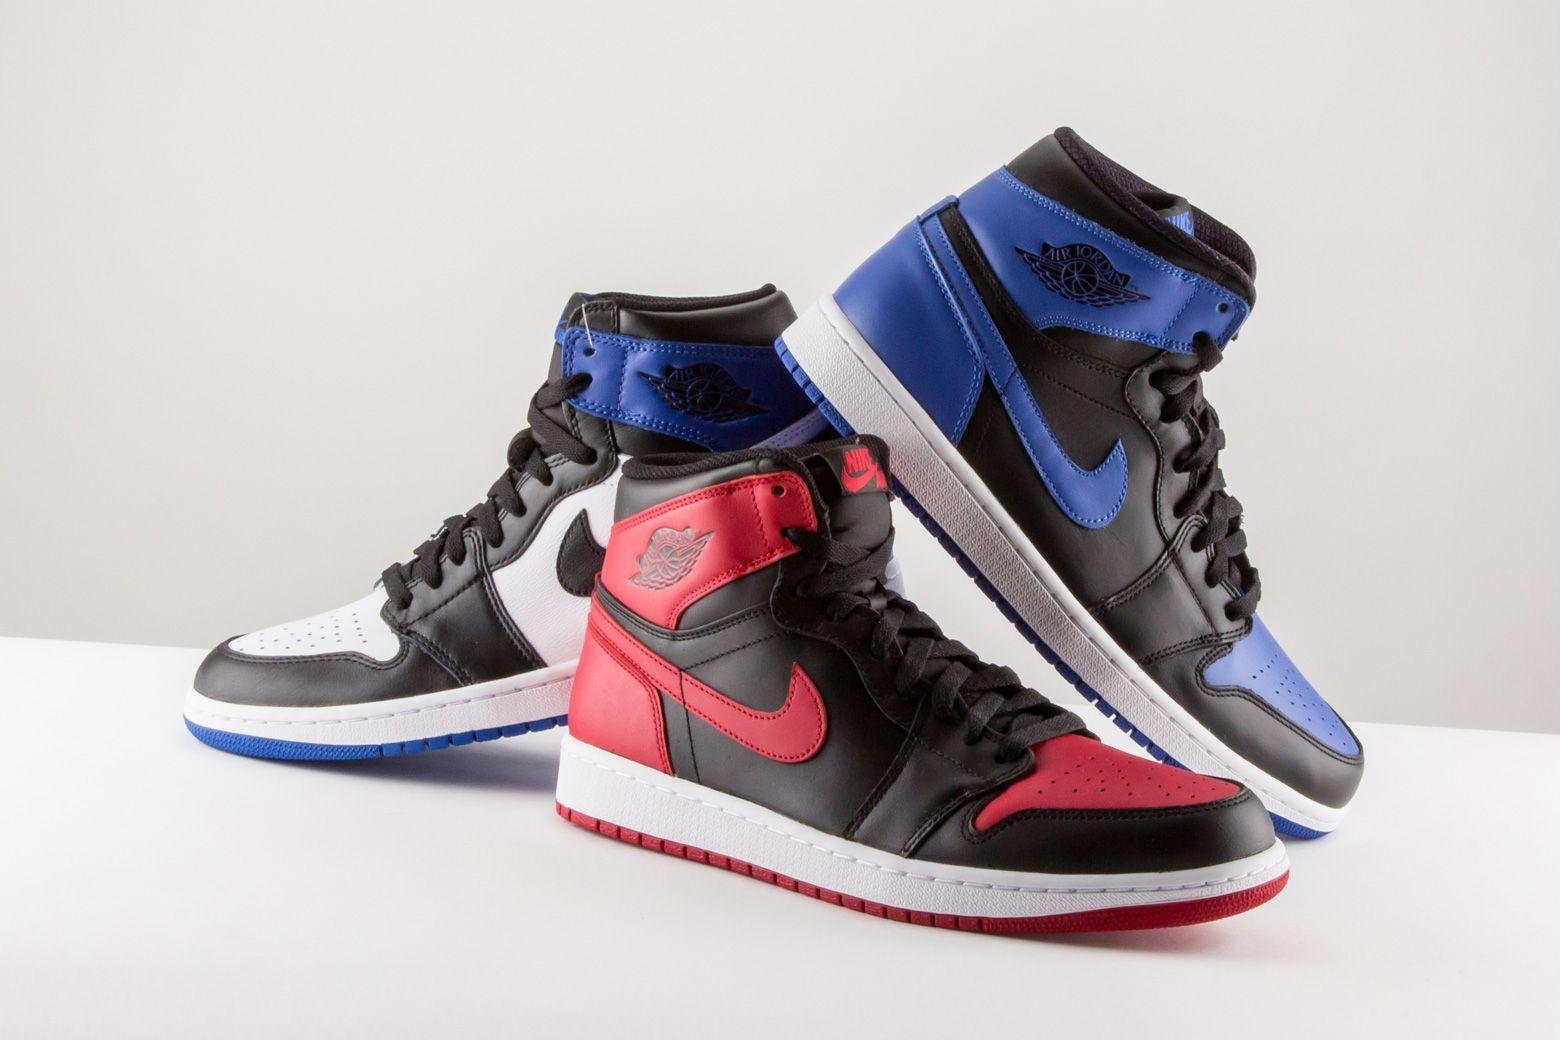 Shop Air Jordan 1 at Stadium Goods | Air jordans, All jordans, Air ...